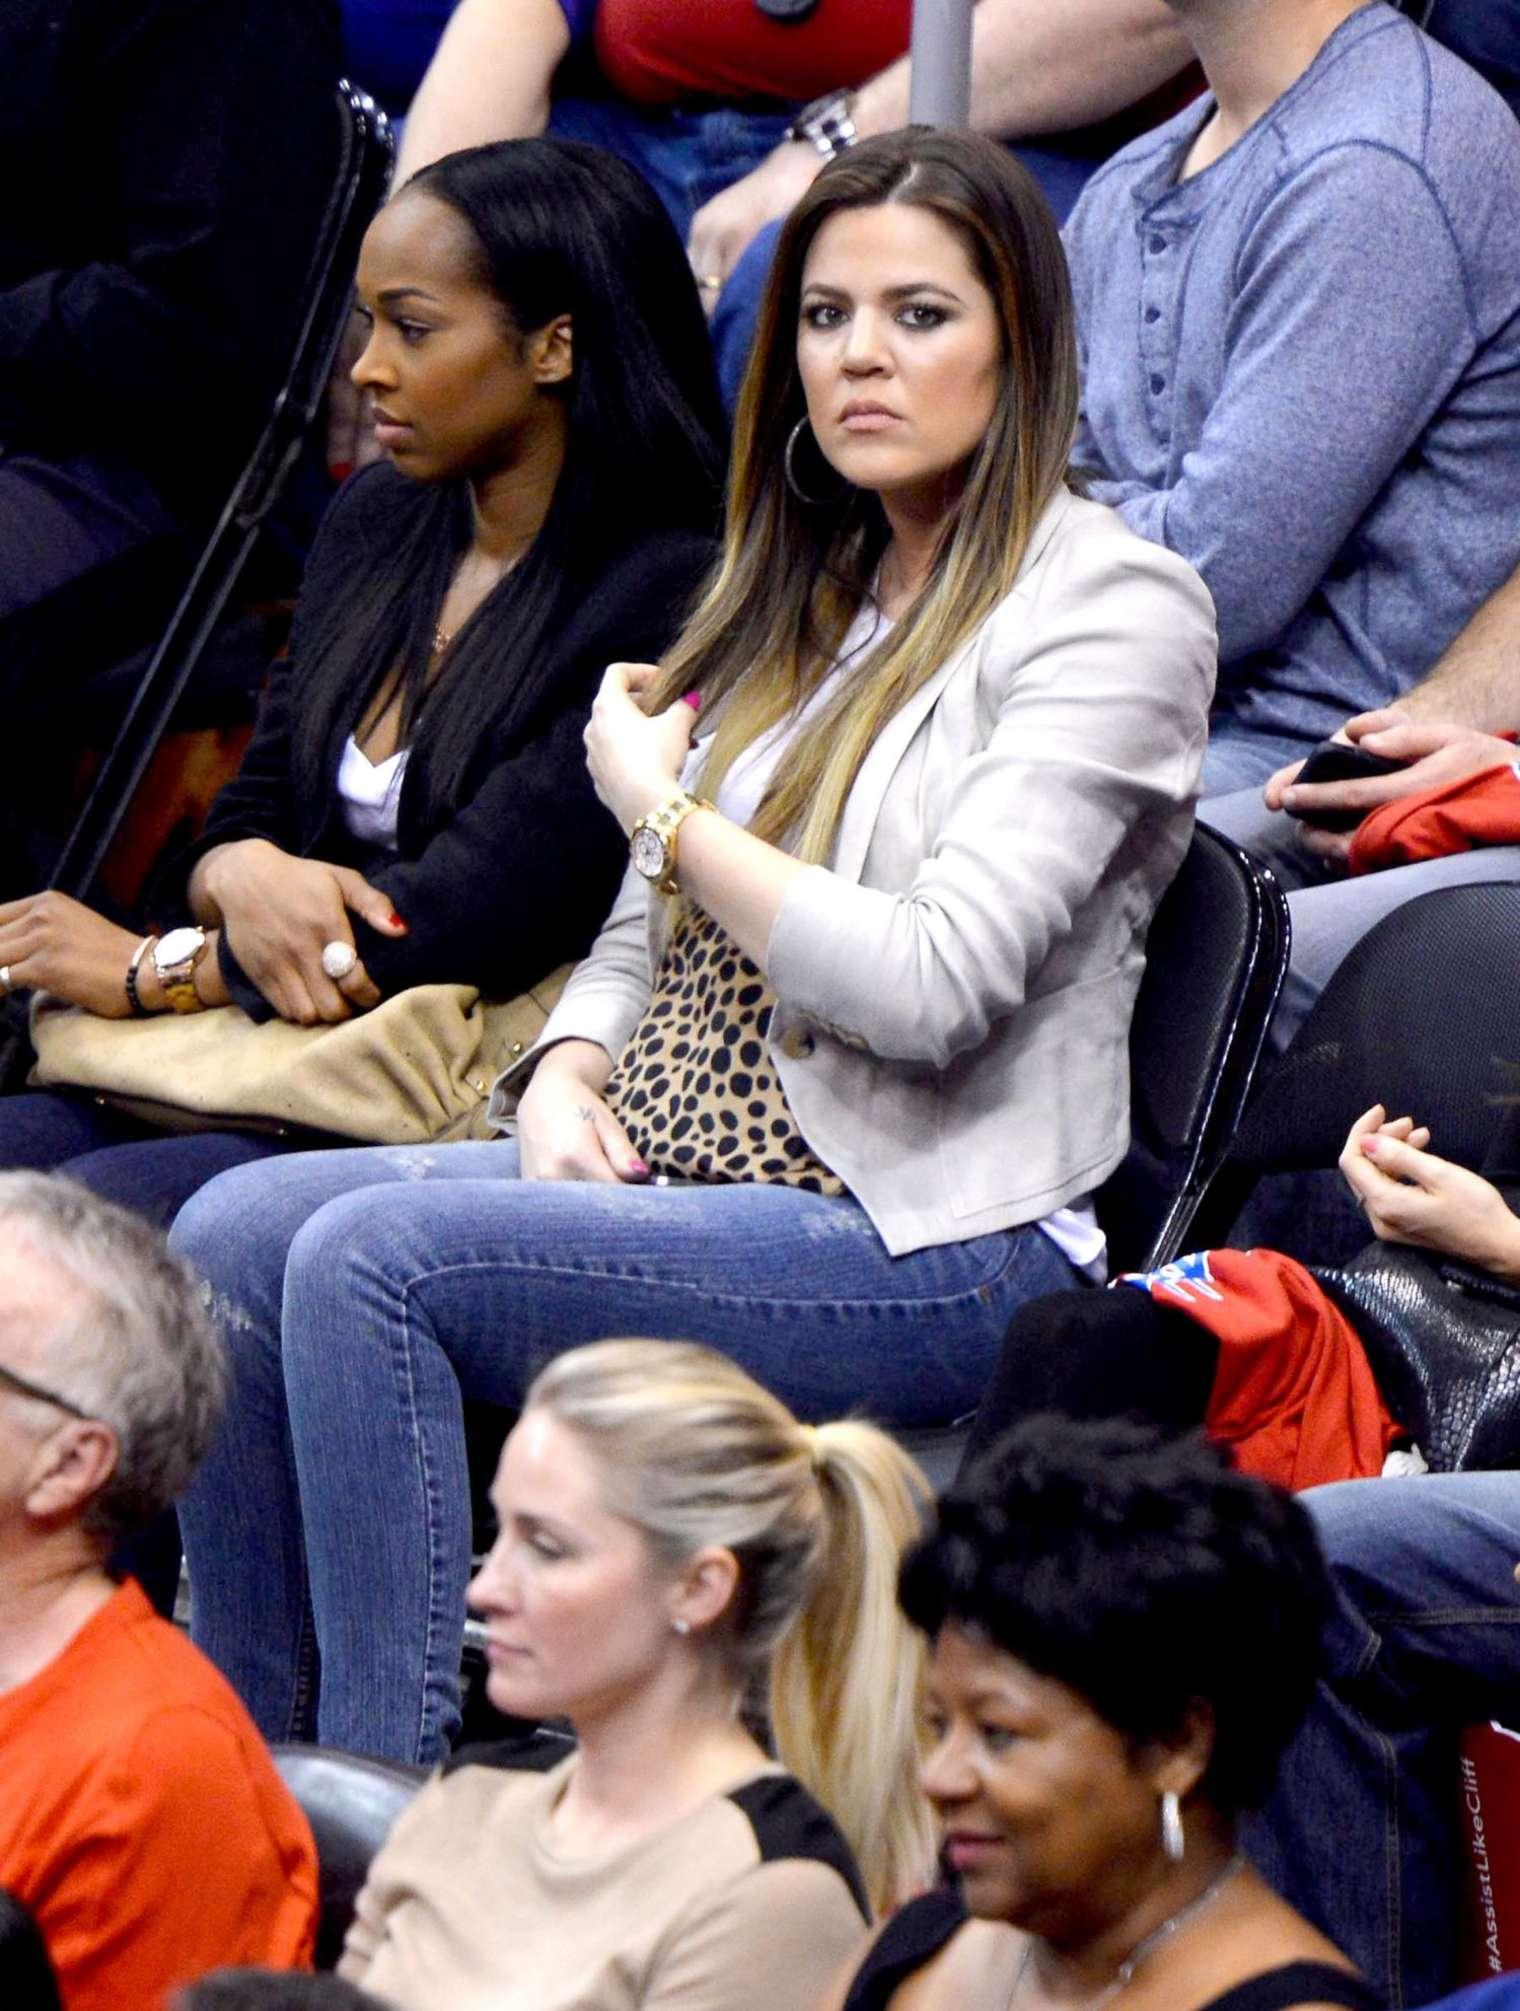 Khloe Kardashian 2013 : Khloe Kardashian at the LA Clippers game -02